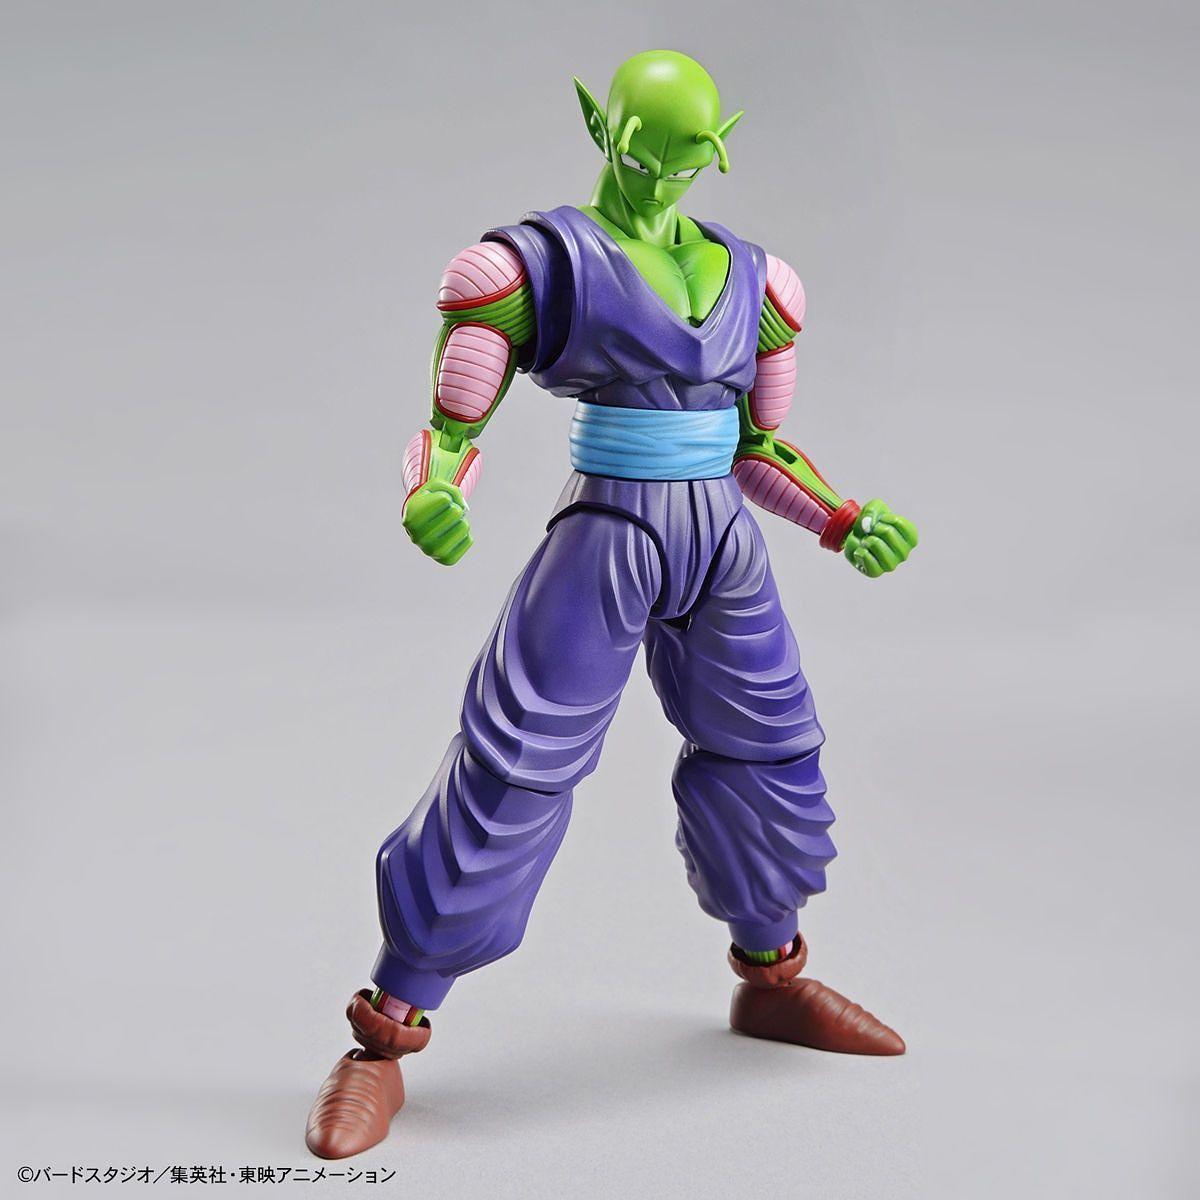 Dragon Ball Figure-rise Standard: Piccolo Renewal Package Ver. - Model Kit image